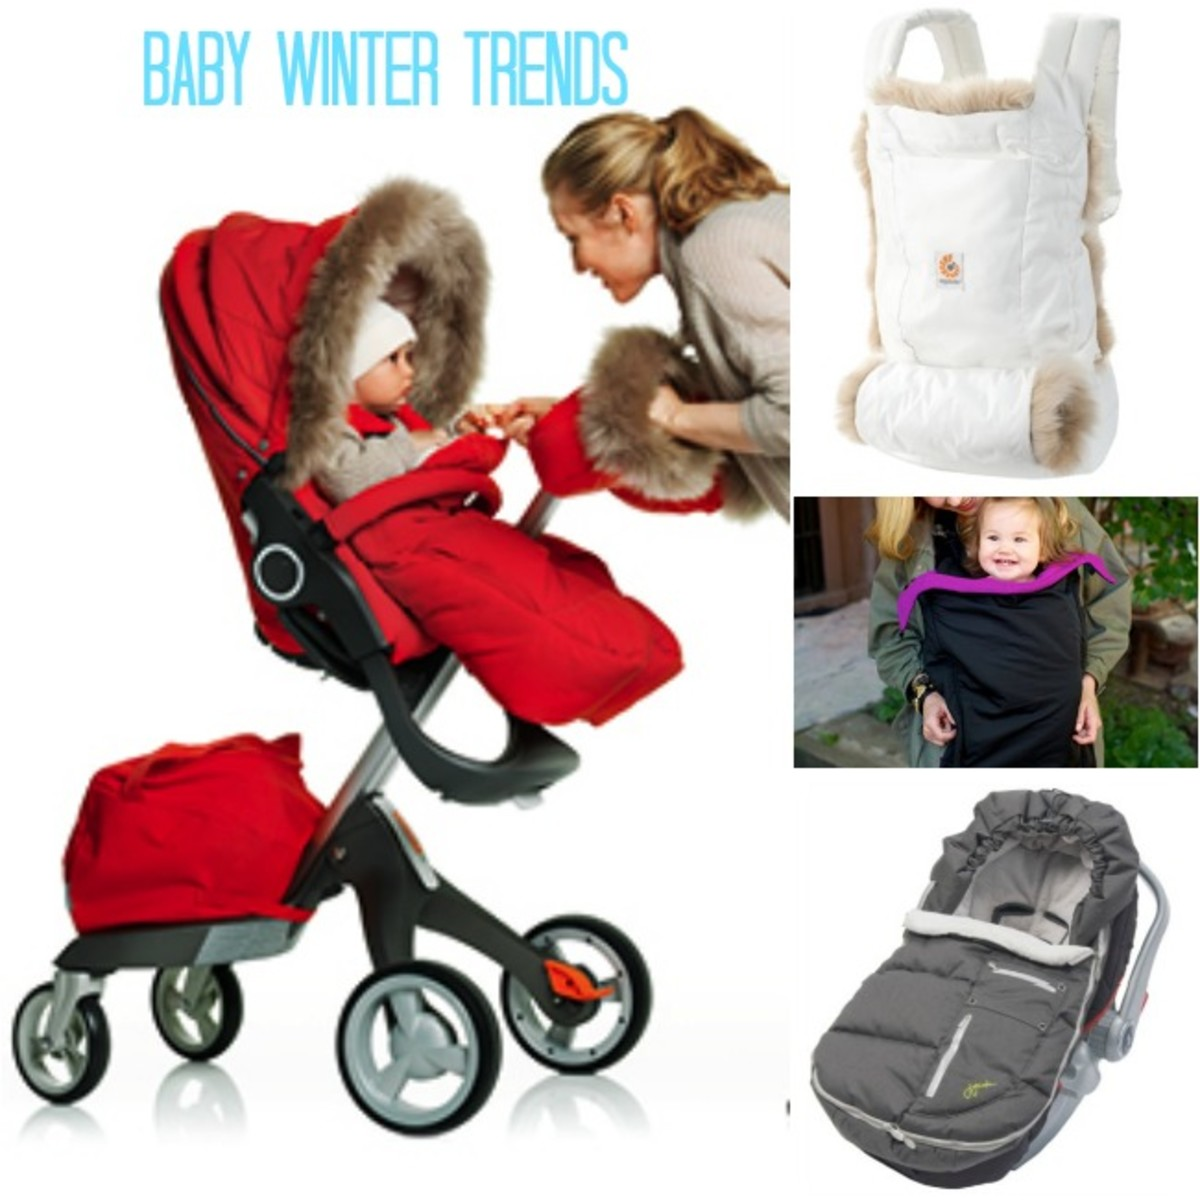 baby winter, stokke, jj cole bundleme, ergobaby, artic bundleme, hatch things, coldsnap